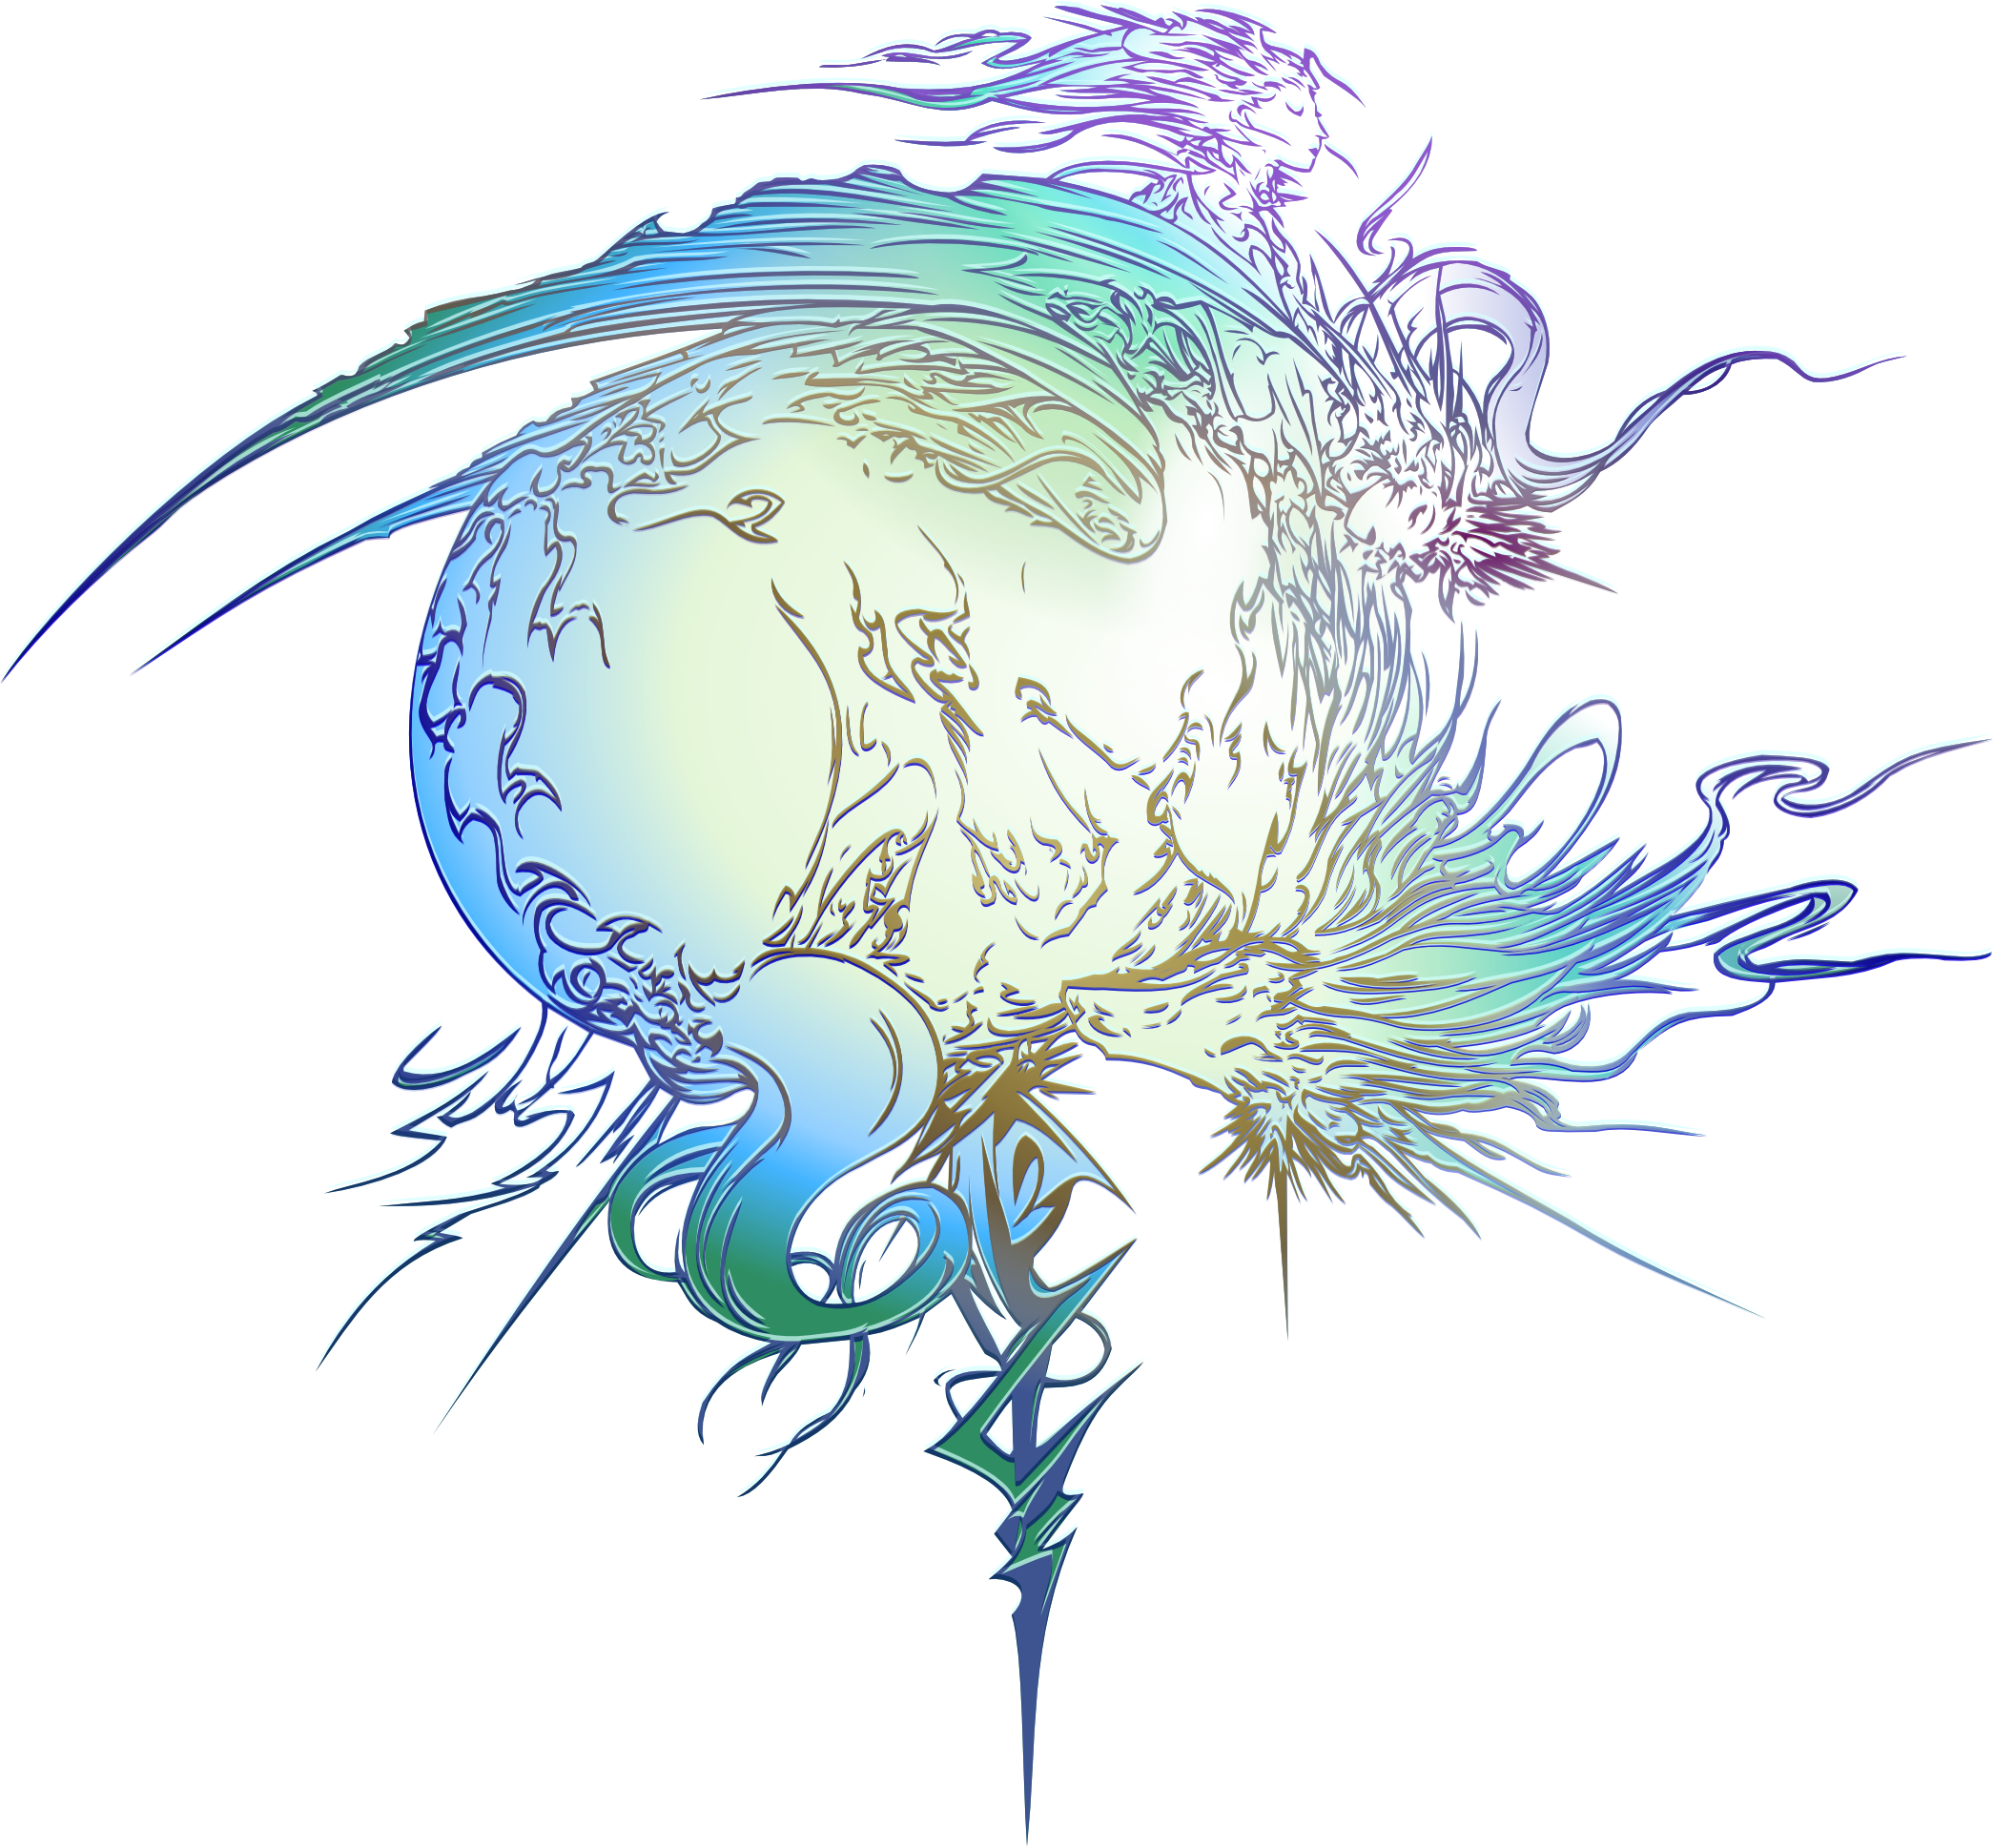 Final fantasy logo art - photo#12